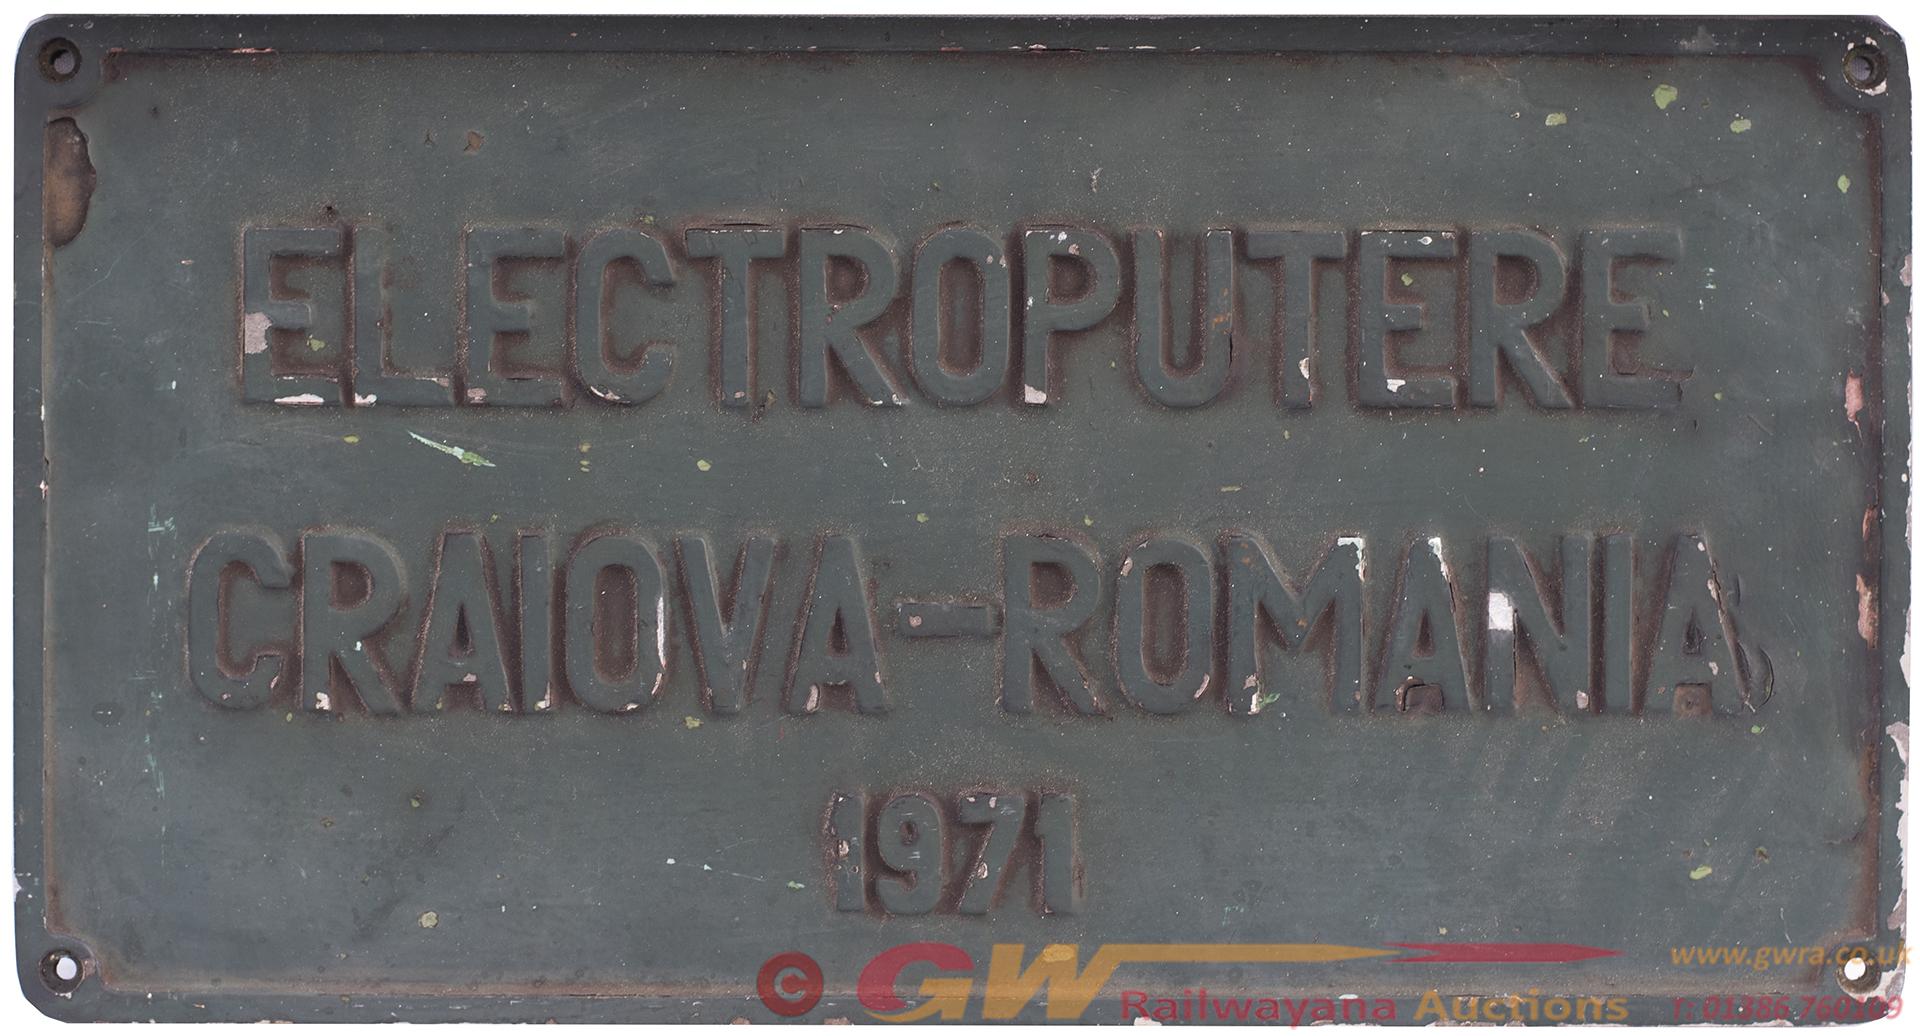 Worksplate ELECTROPUTERE CRAIOVA - ROMANIA 1971 Ex